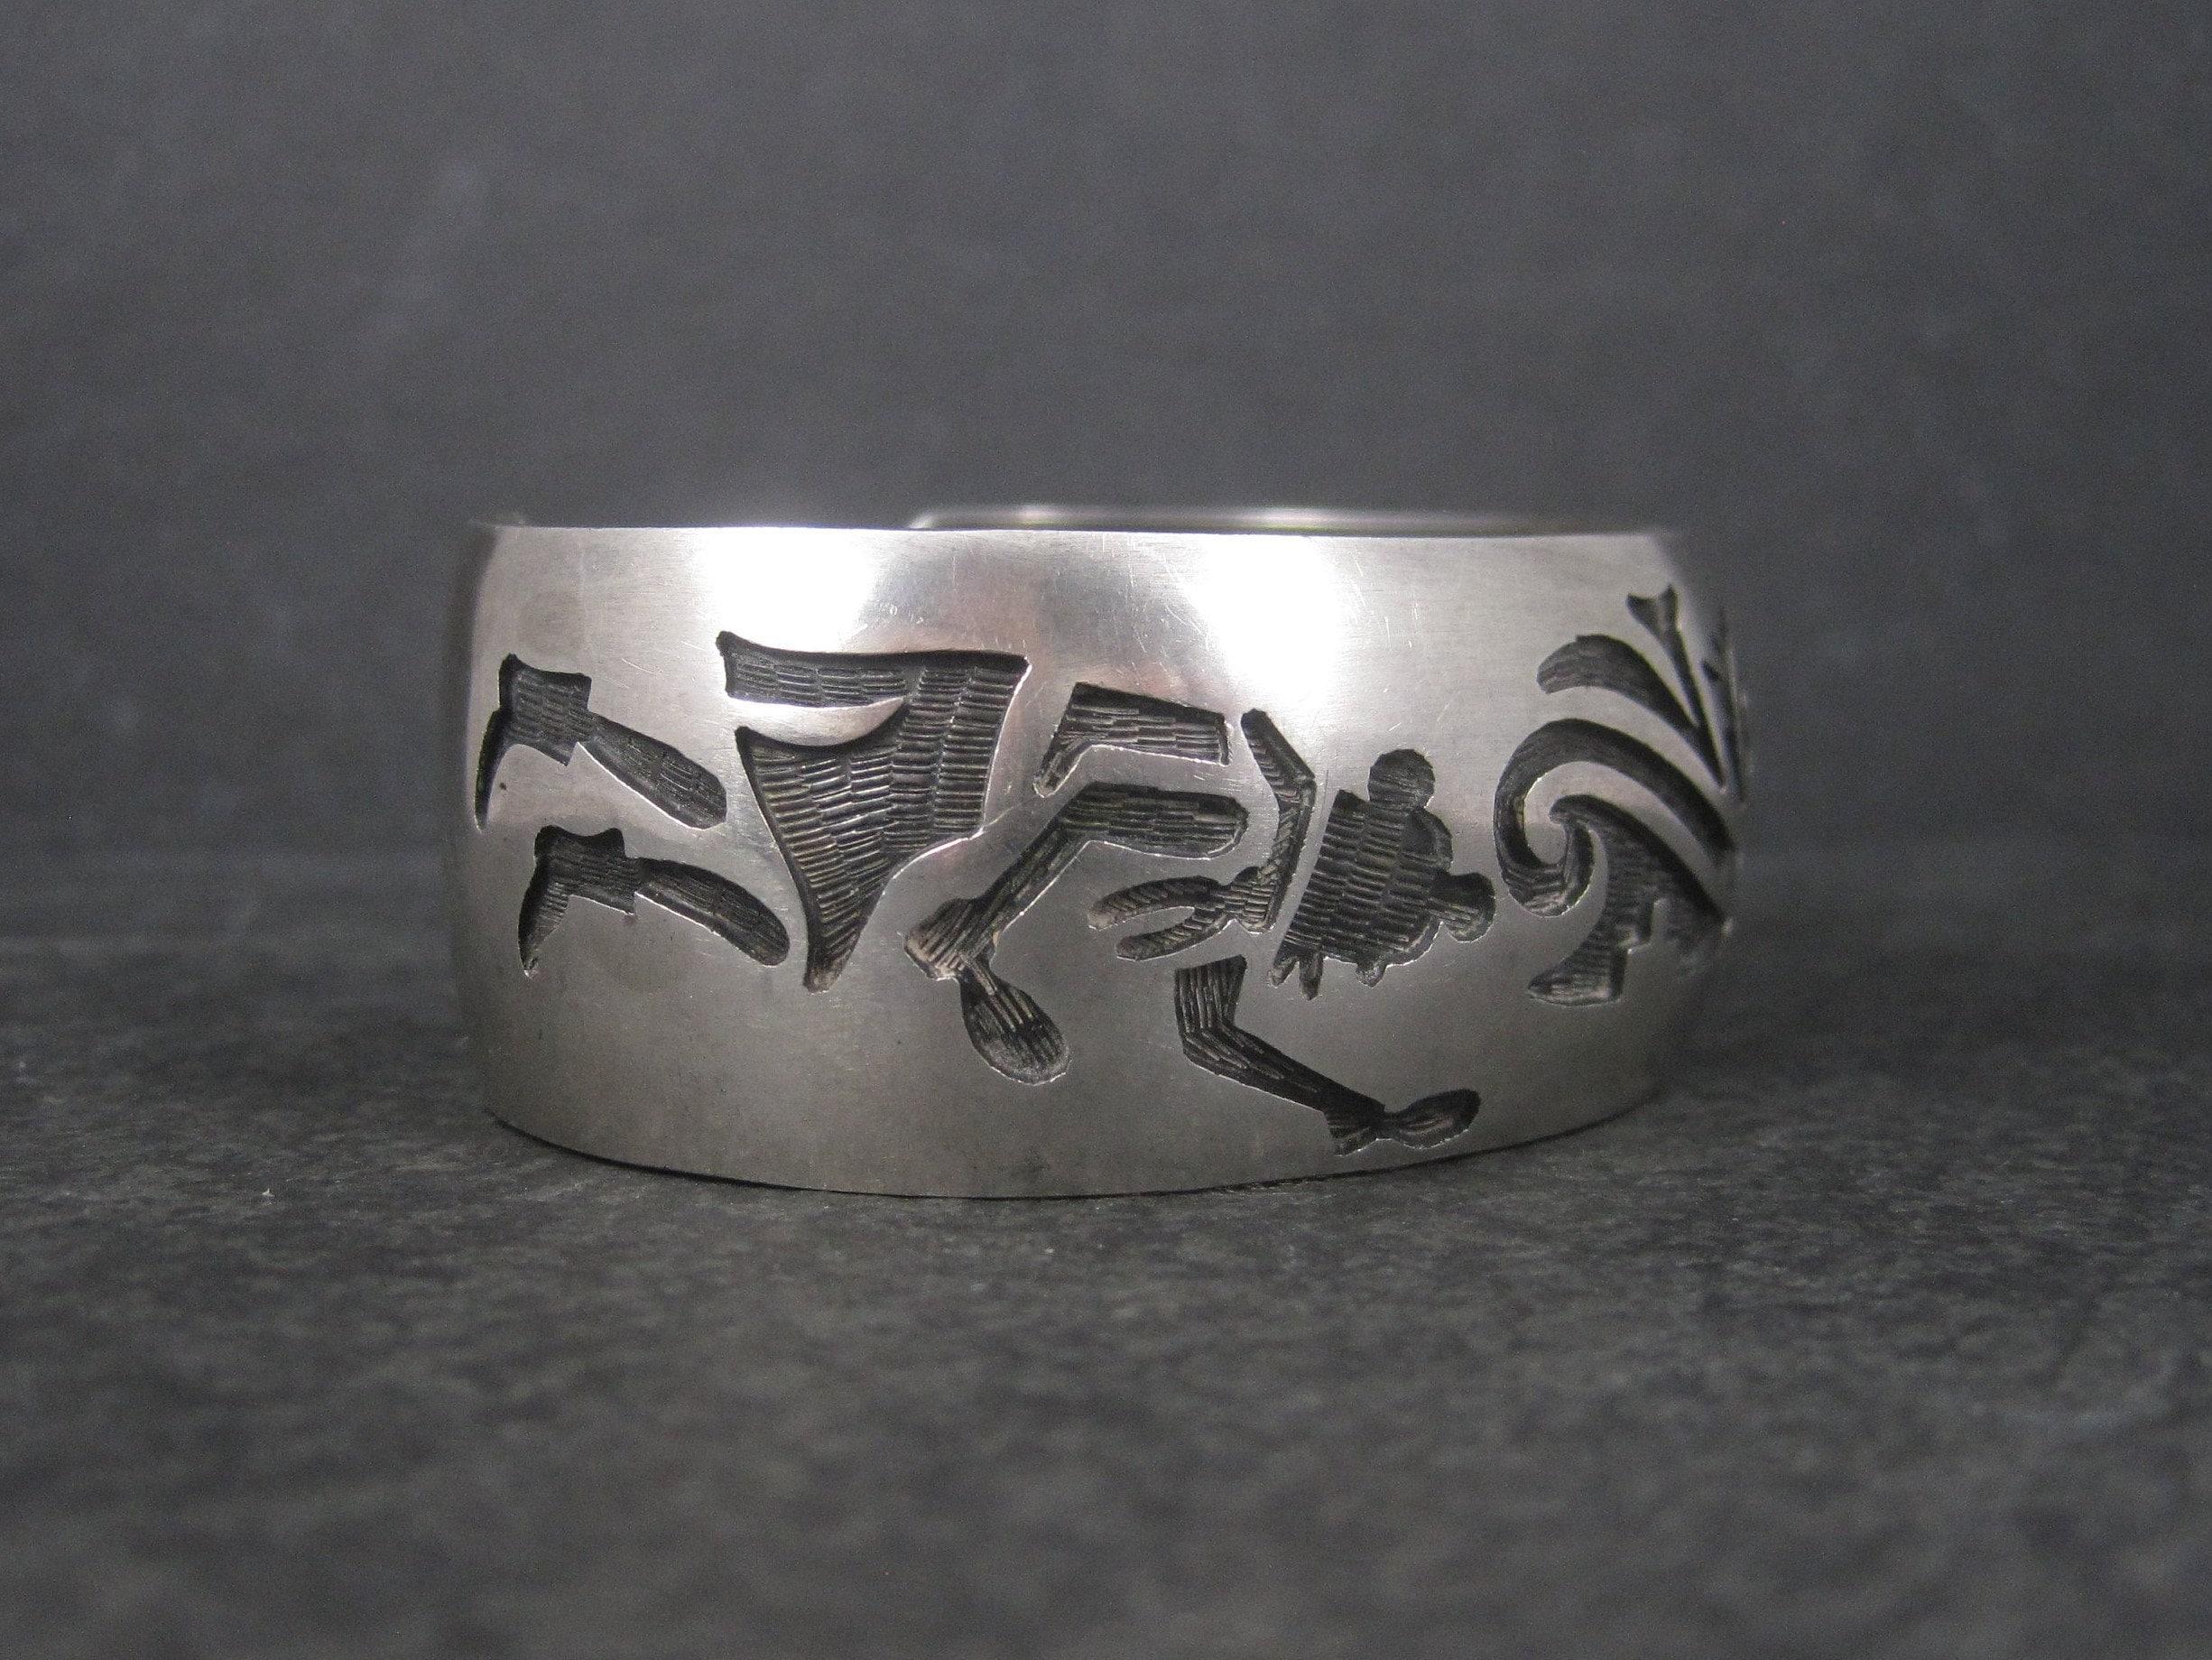 Vintage Hopi Kachina Cuff Bracelet from Bejeweled Emporium